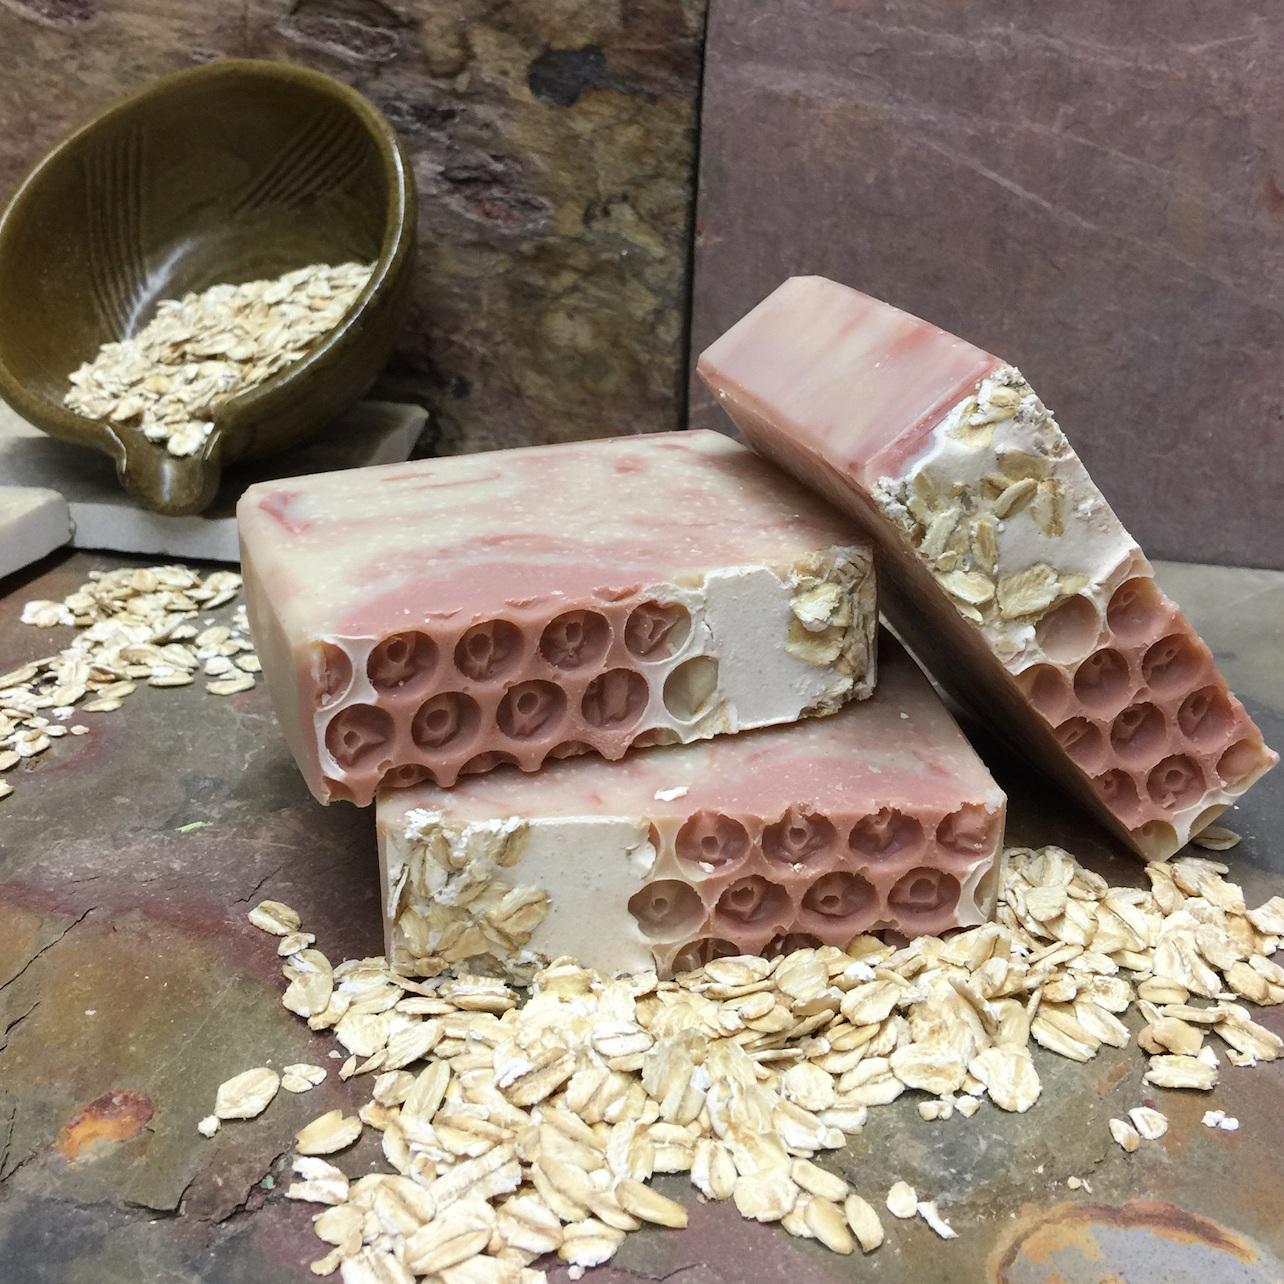 Peightons Place Hand Made Soap | Nixa MO